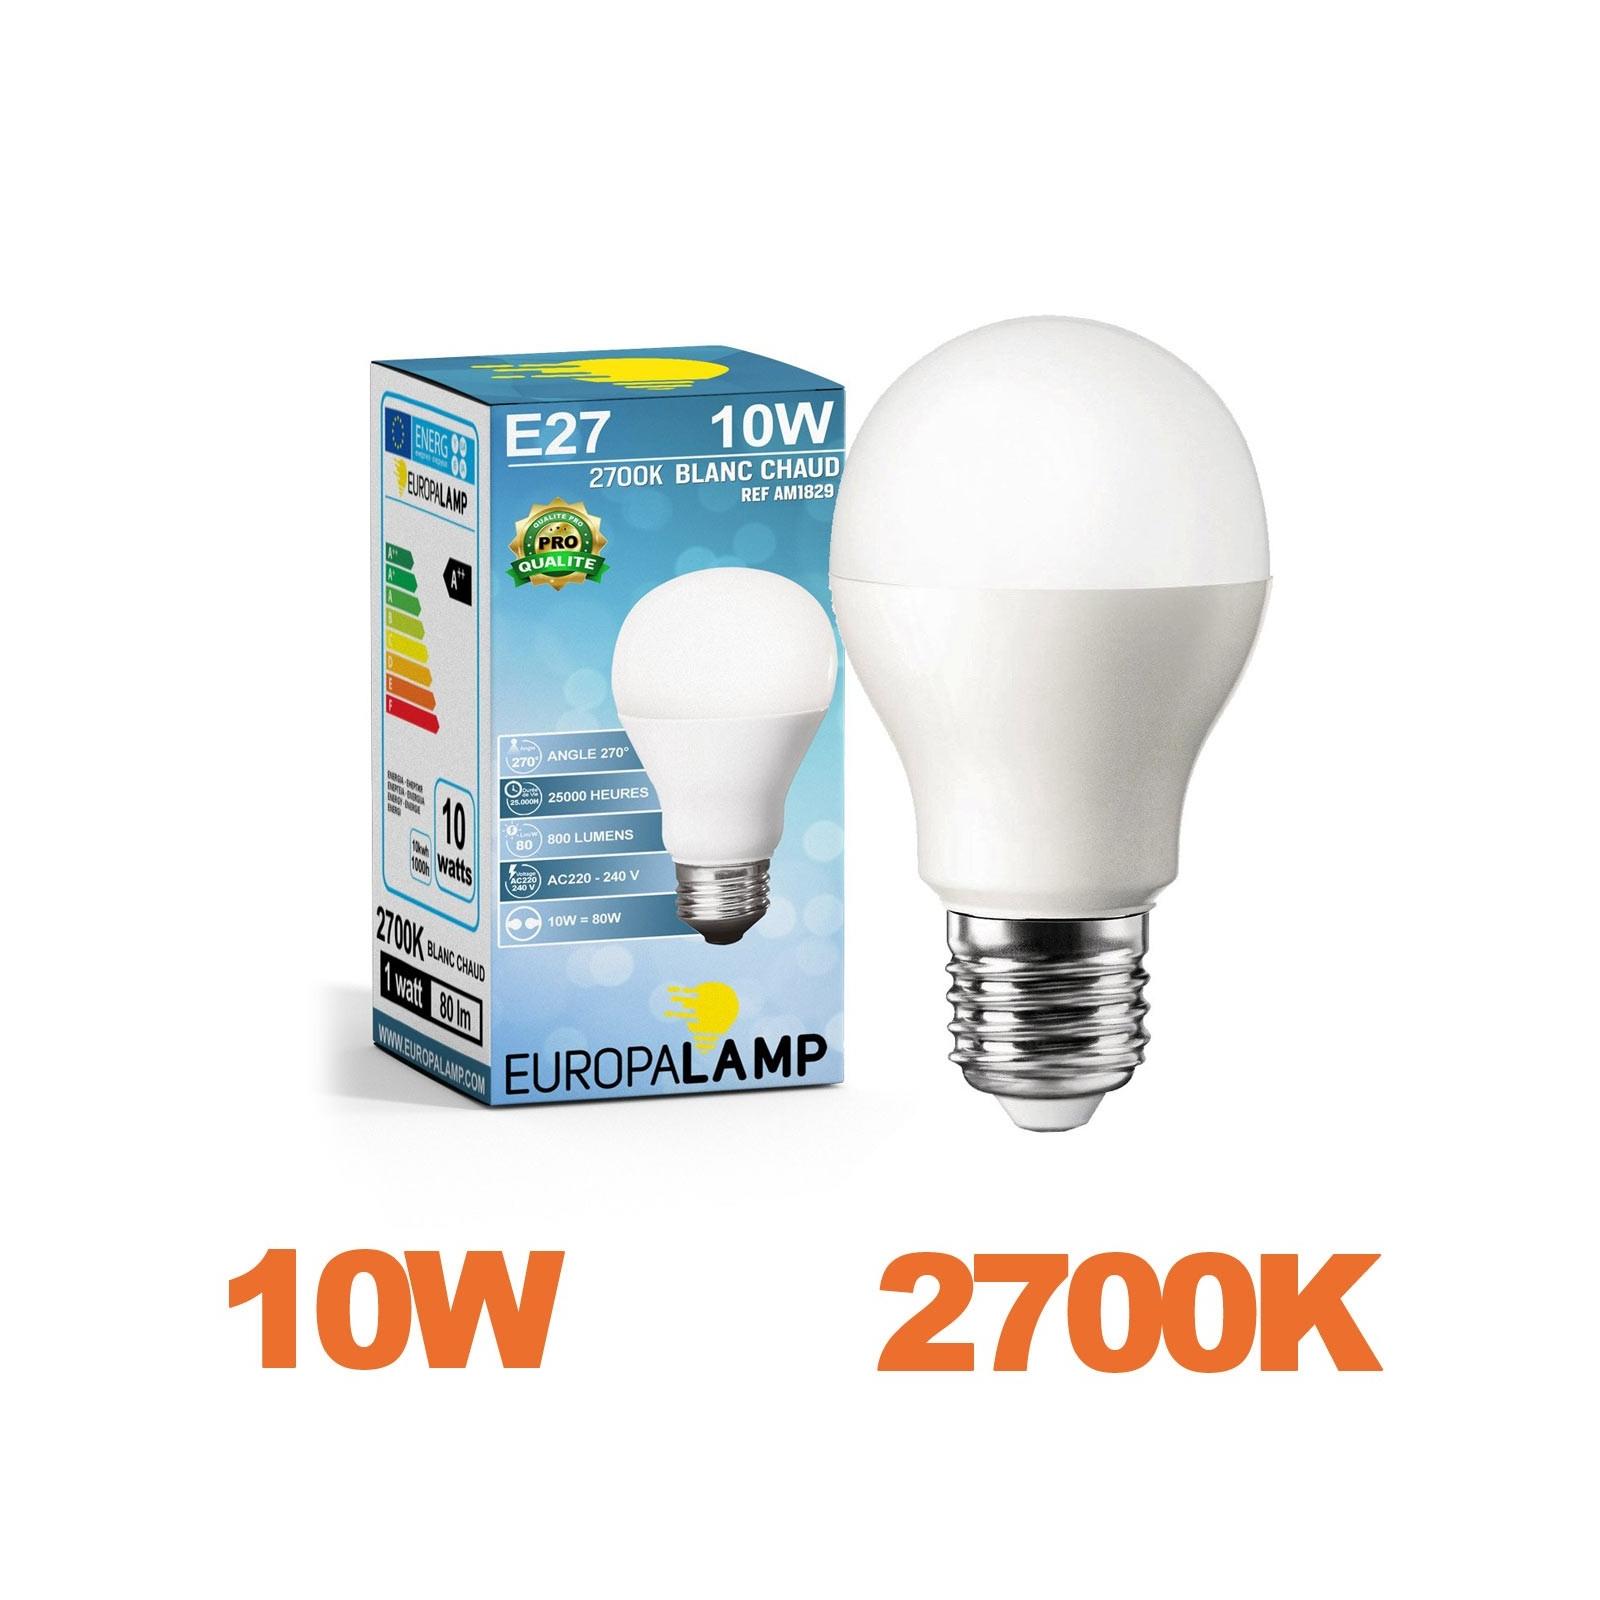 Blanc Culot 2700k Led Puissance Chaud Ampoule 10w E27 By6mf7gyiv UzVqMSp